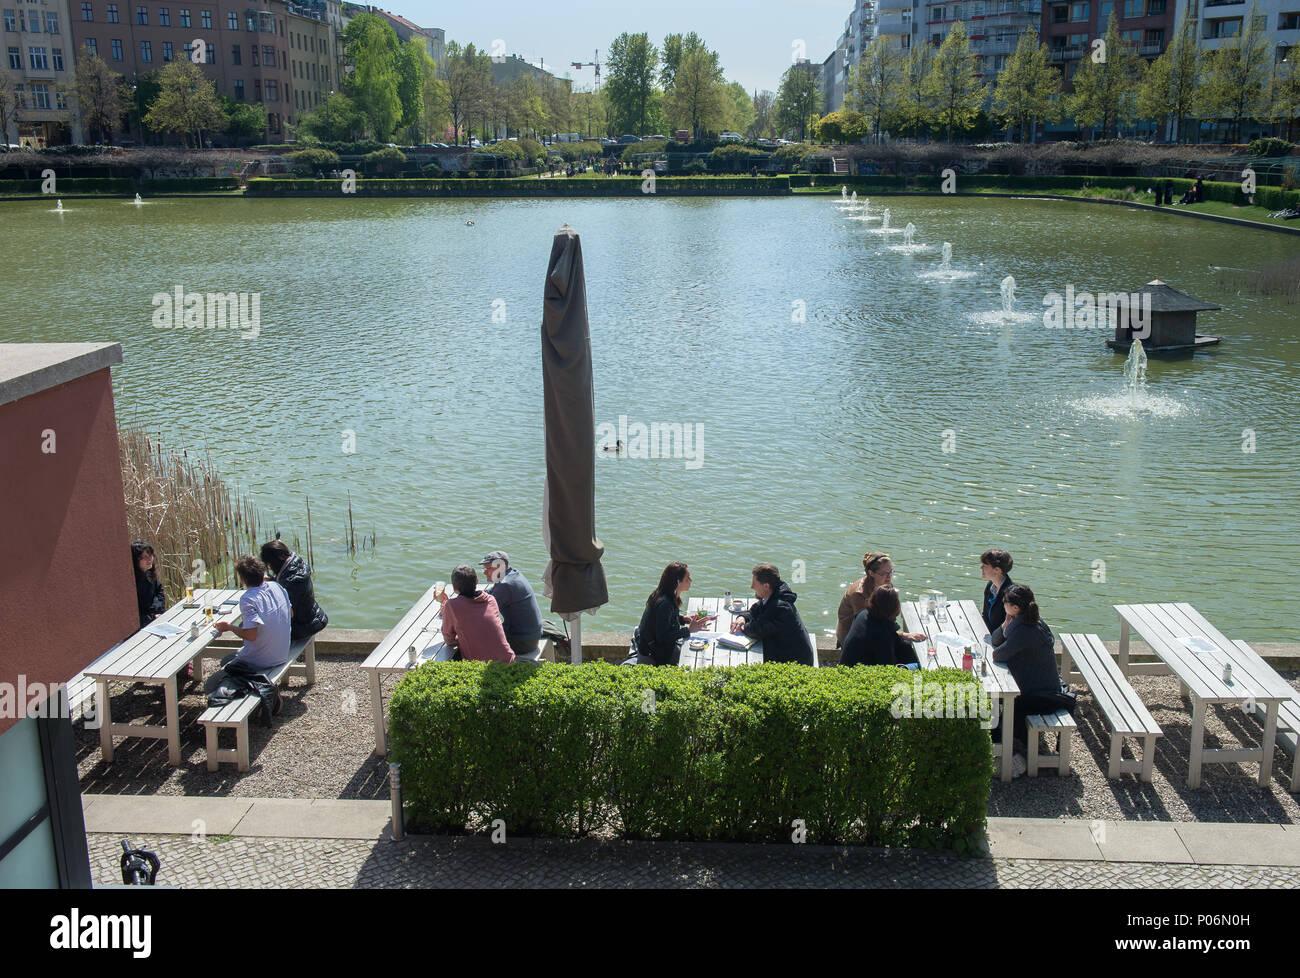 Berlin, Germany, Guests at Cafe am Engelbecken - Stock Image